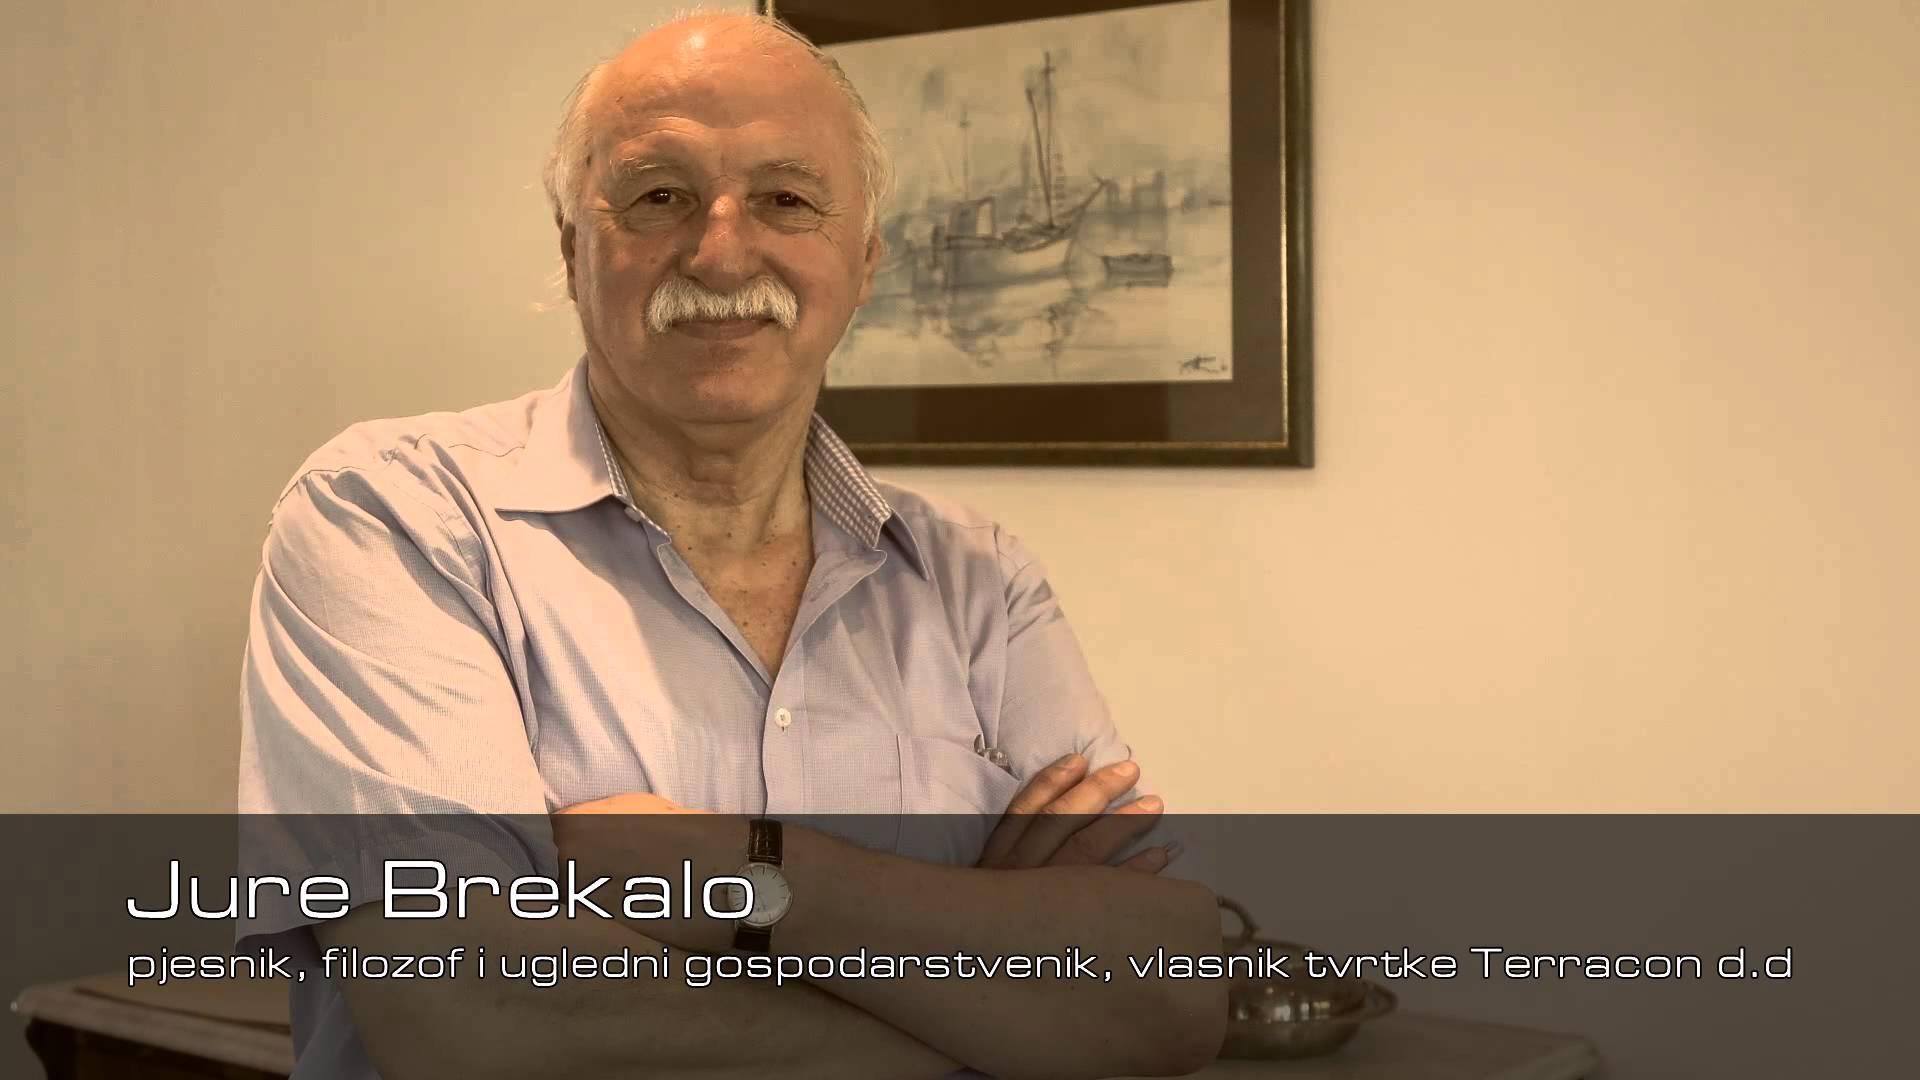 Otvoreno pismo za medije od pjesnika i izdavača Jure Brekala